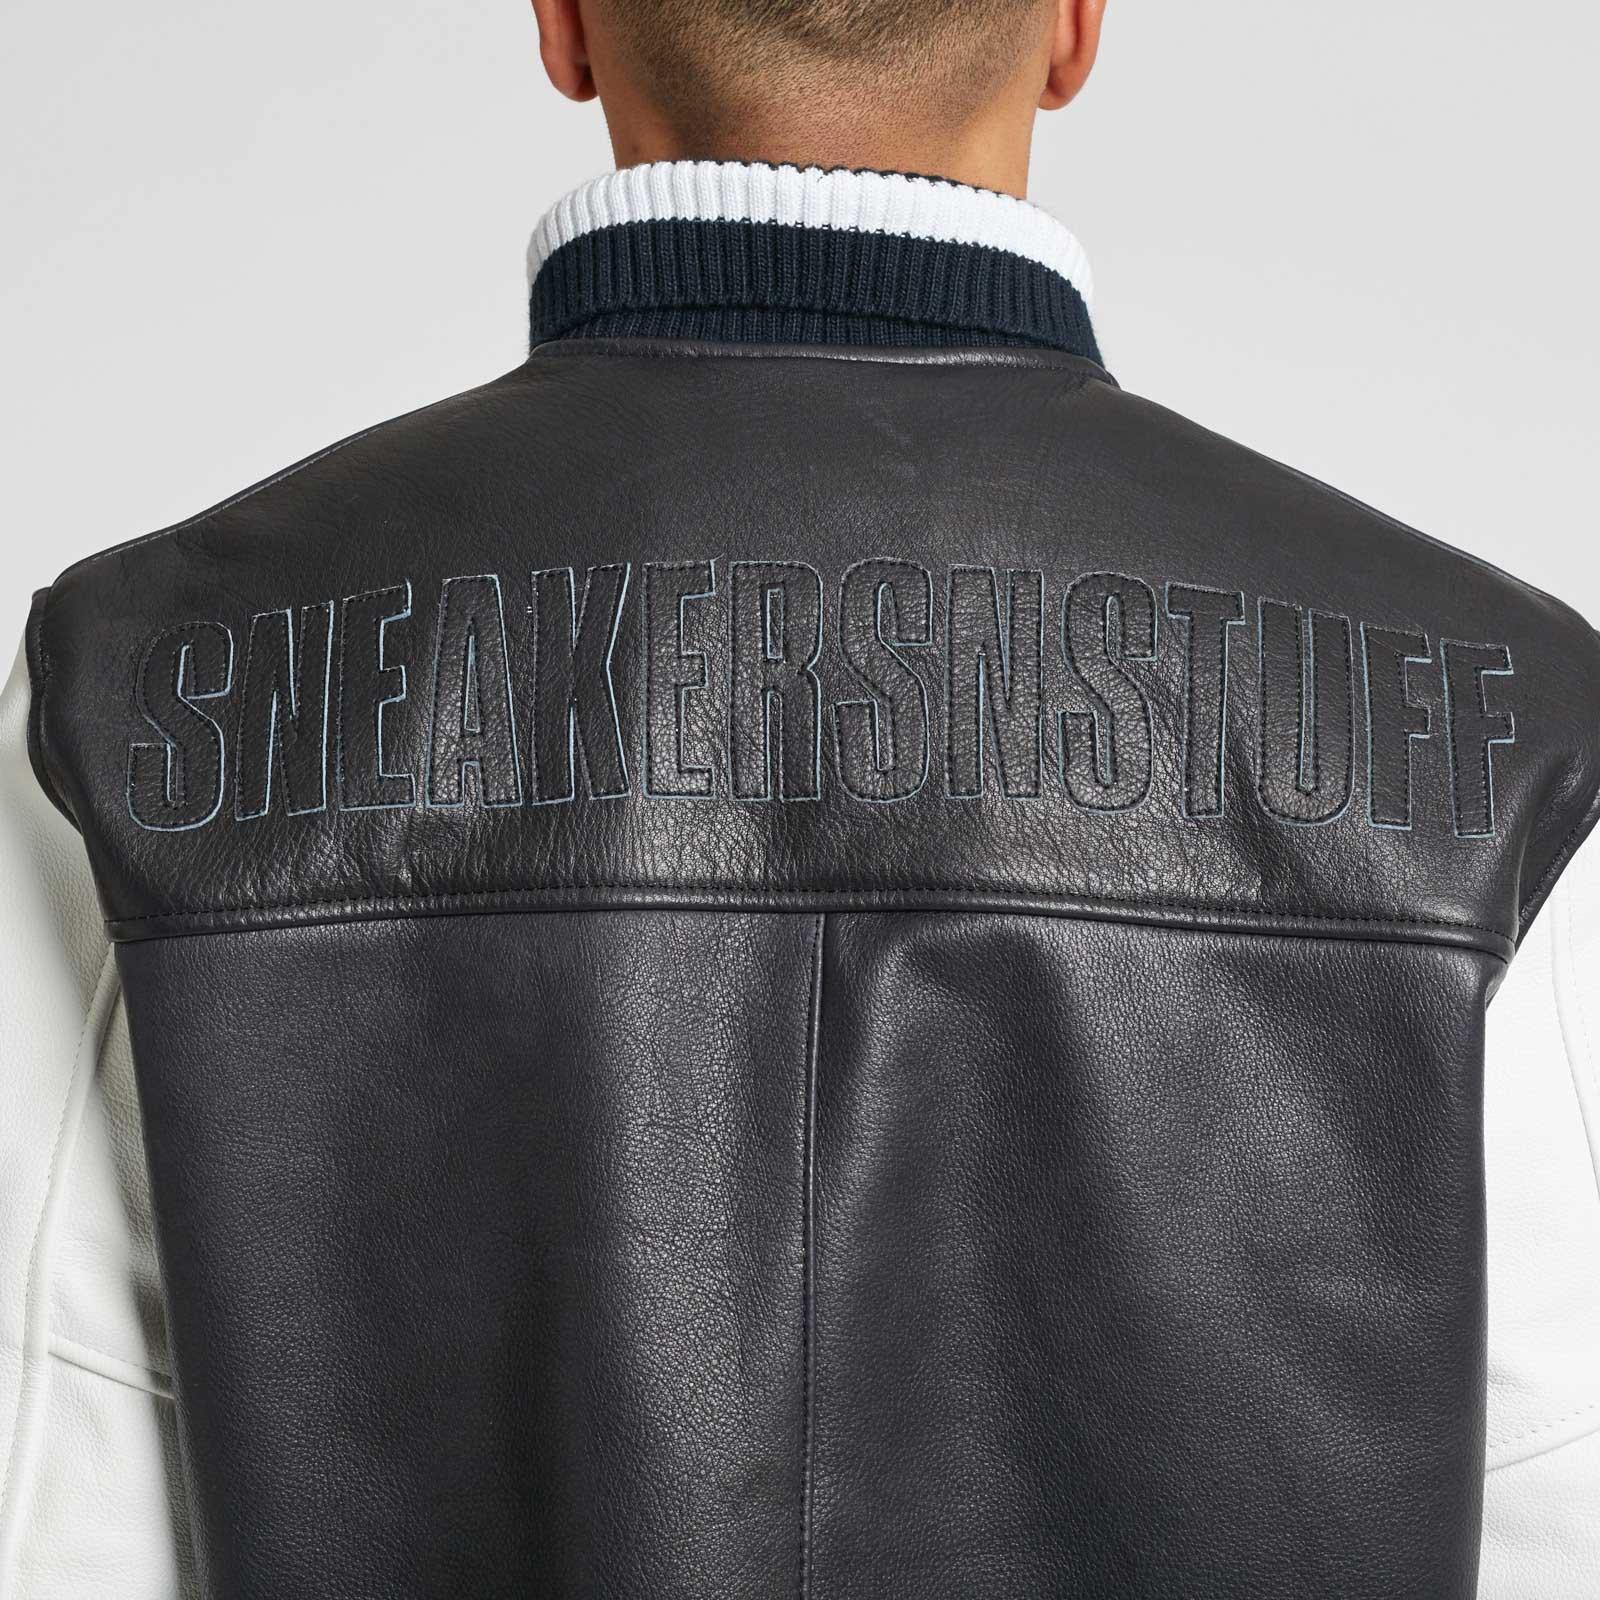 converse letterman jacket